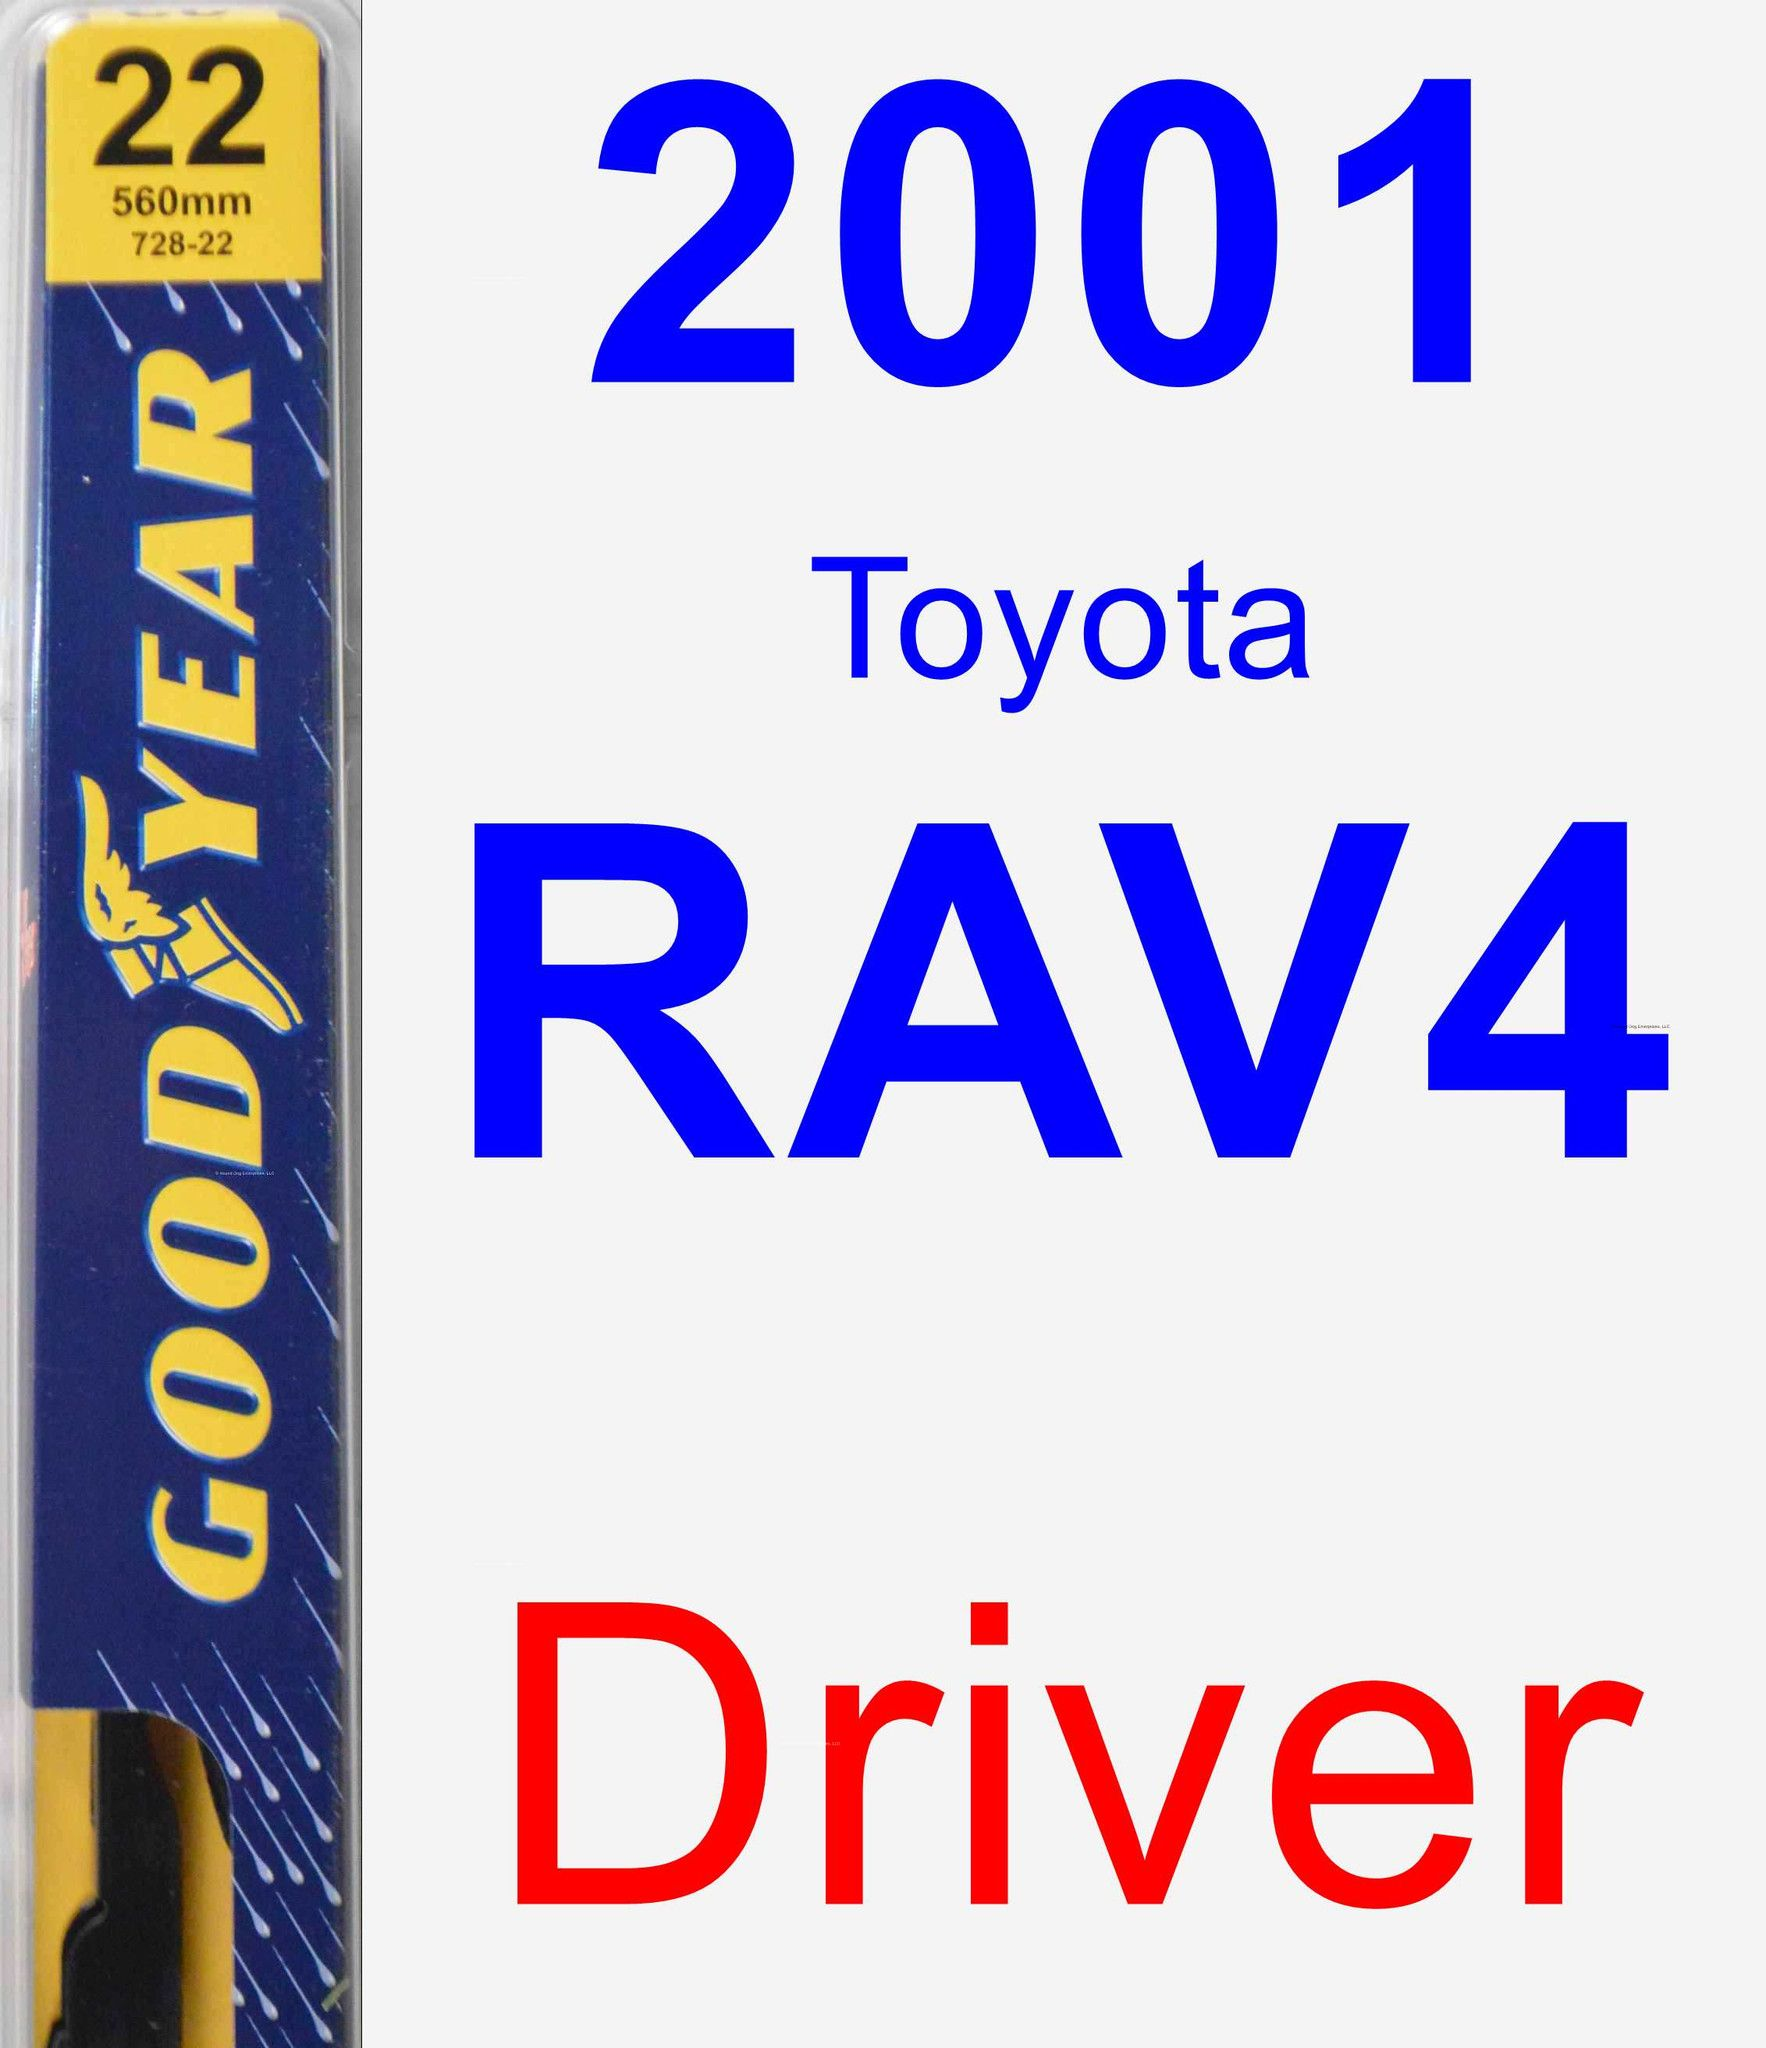 Driver Wiper Blade For 2001 Toyota RAV4 - Premium